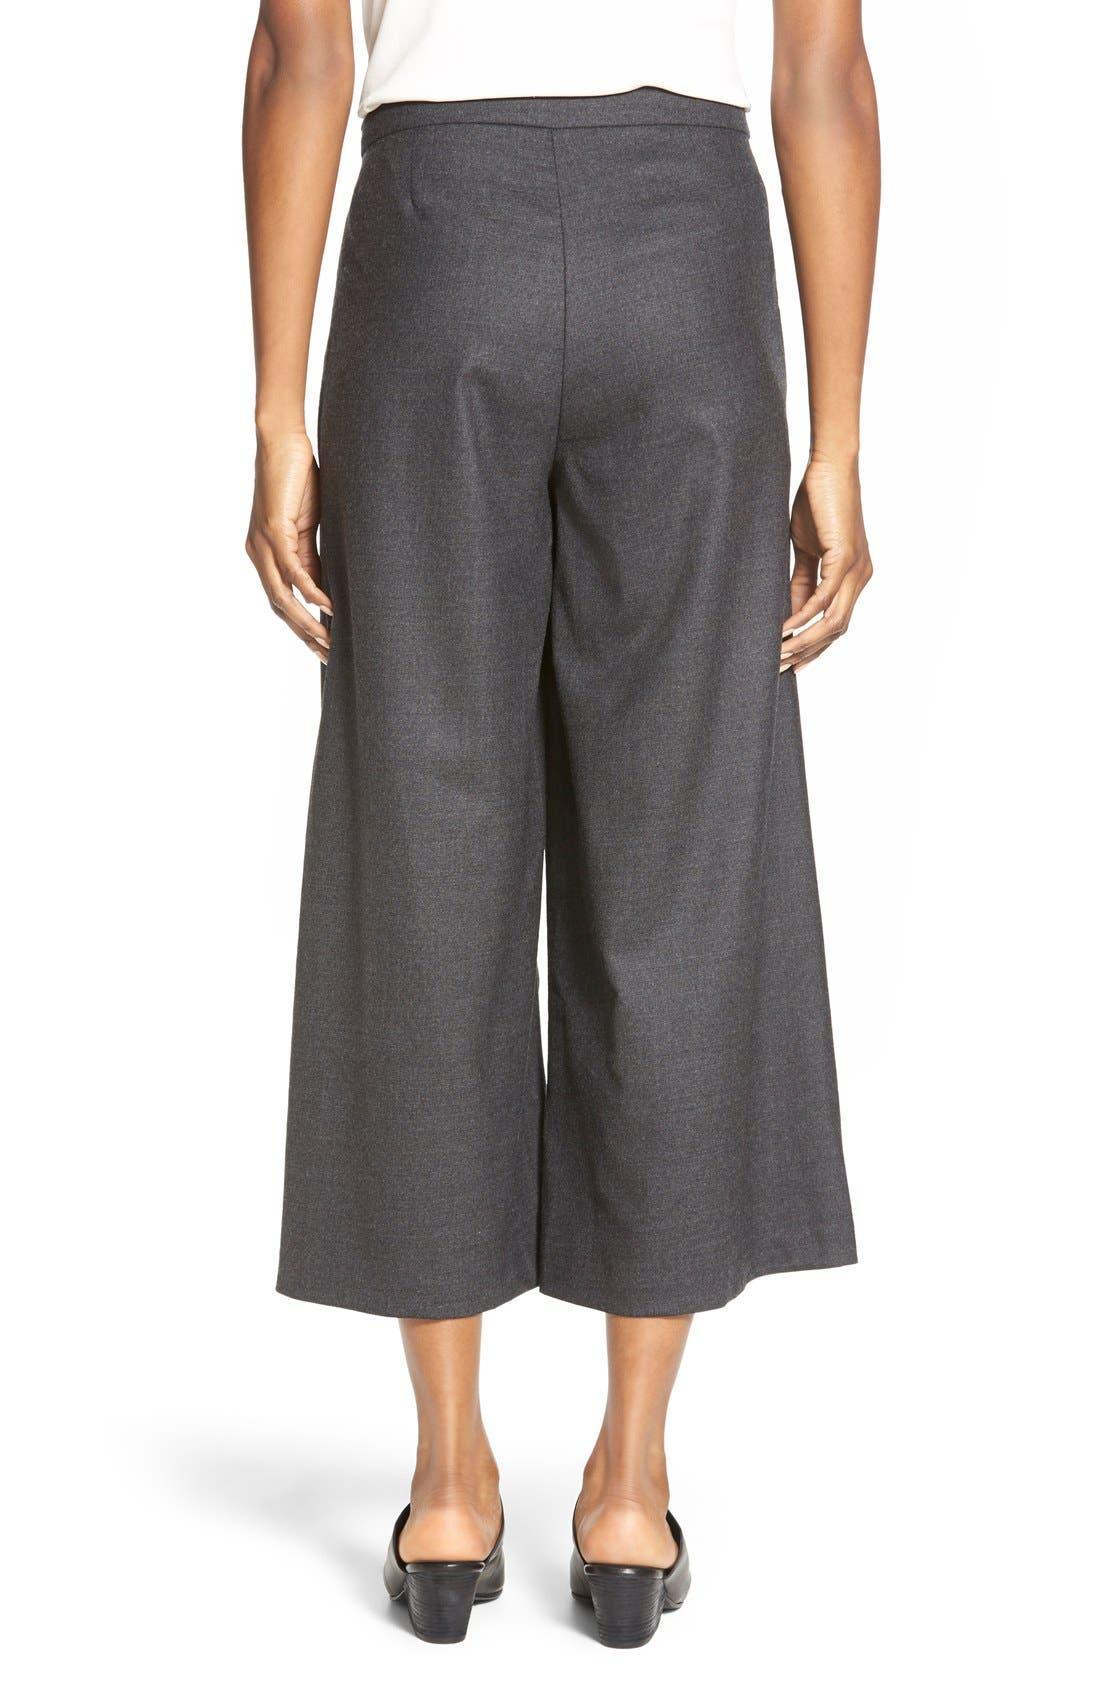 Alternate Image 2  - Eileen Fisher Wool Twill Sarong Pants  (Regular & Petite)